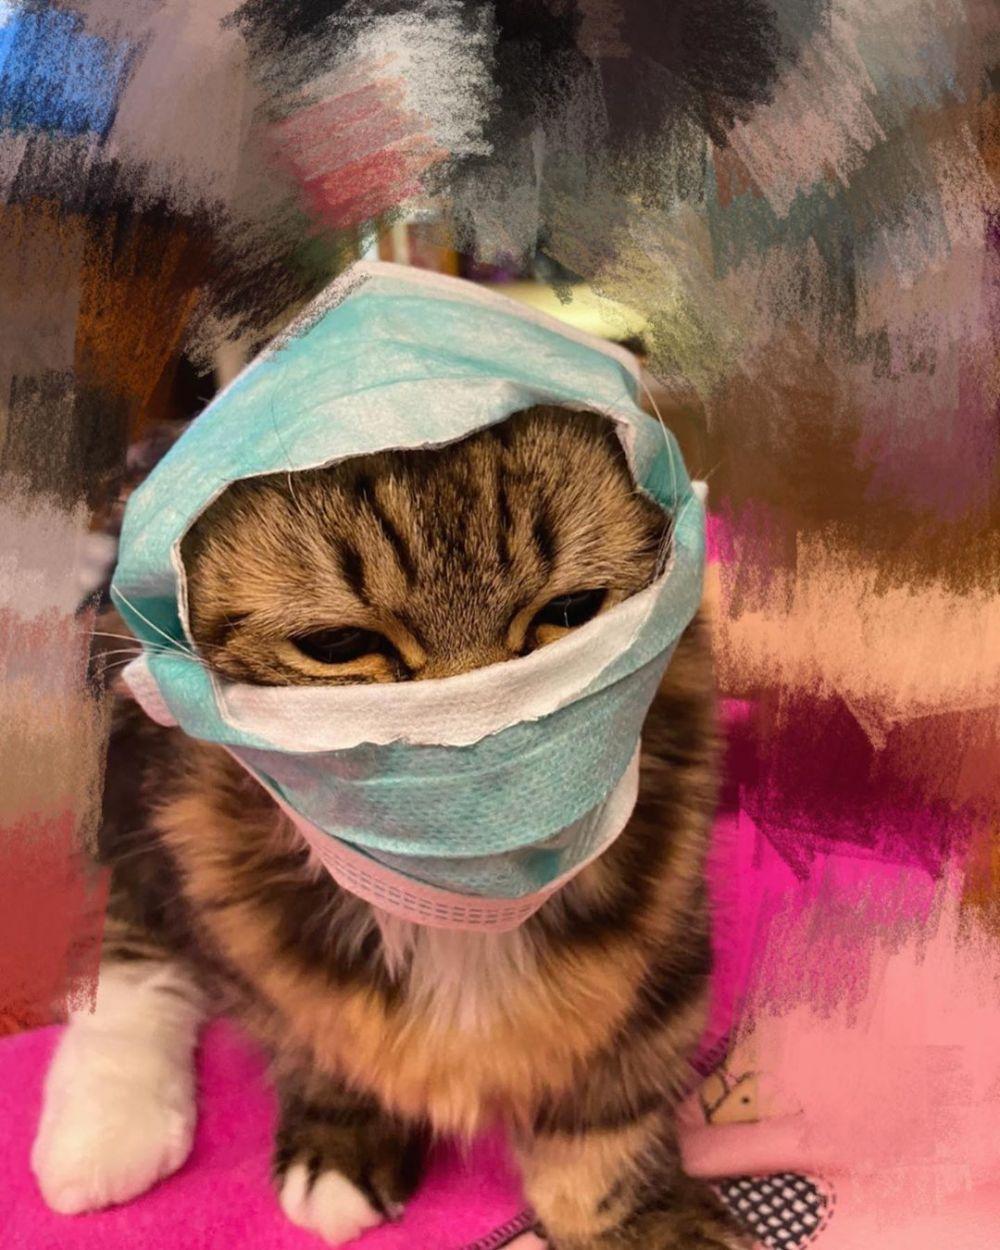 Gambar Kucing Pakai Masker godean.web.id